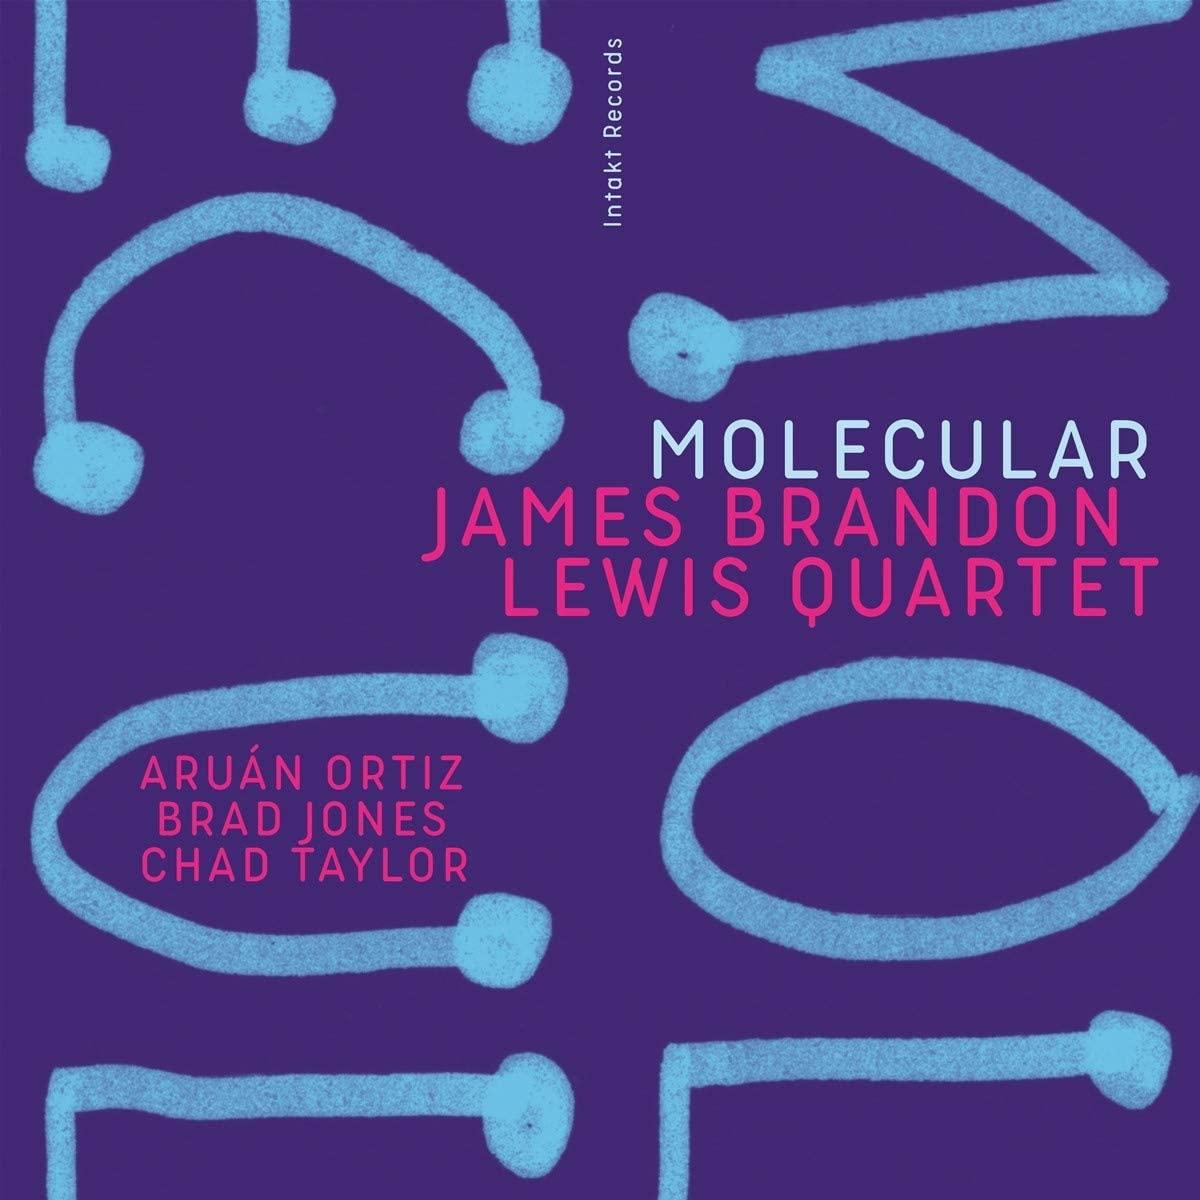 JAMES BRANDON LEWIS - James Brandon Lewis Quartet : Molecular cover